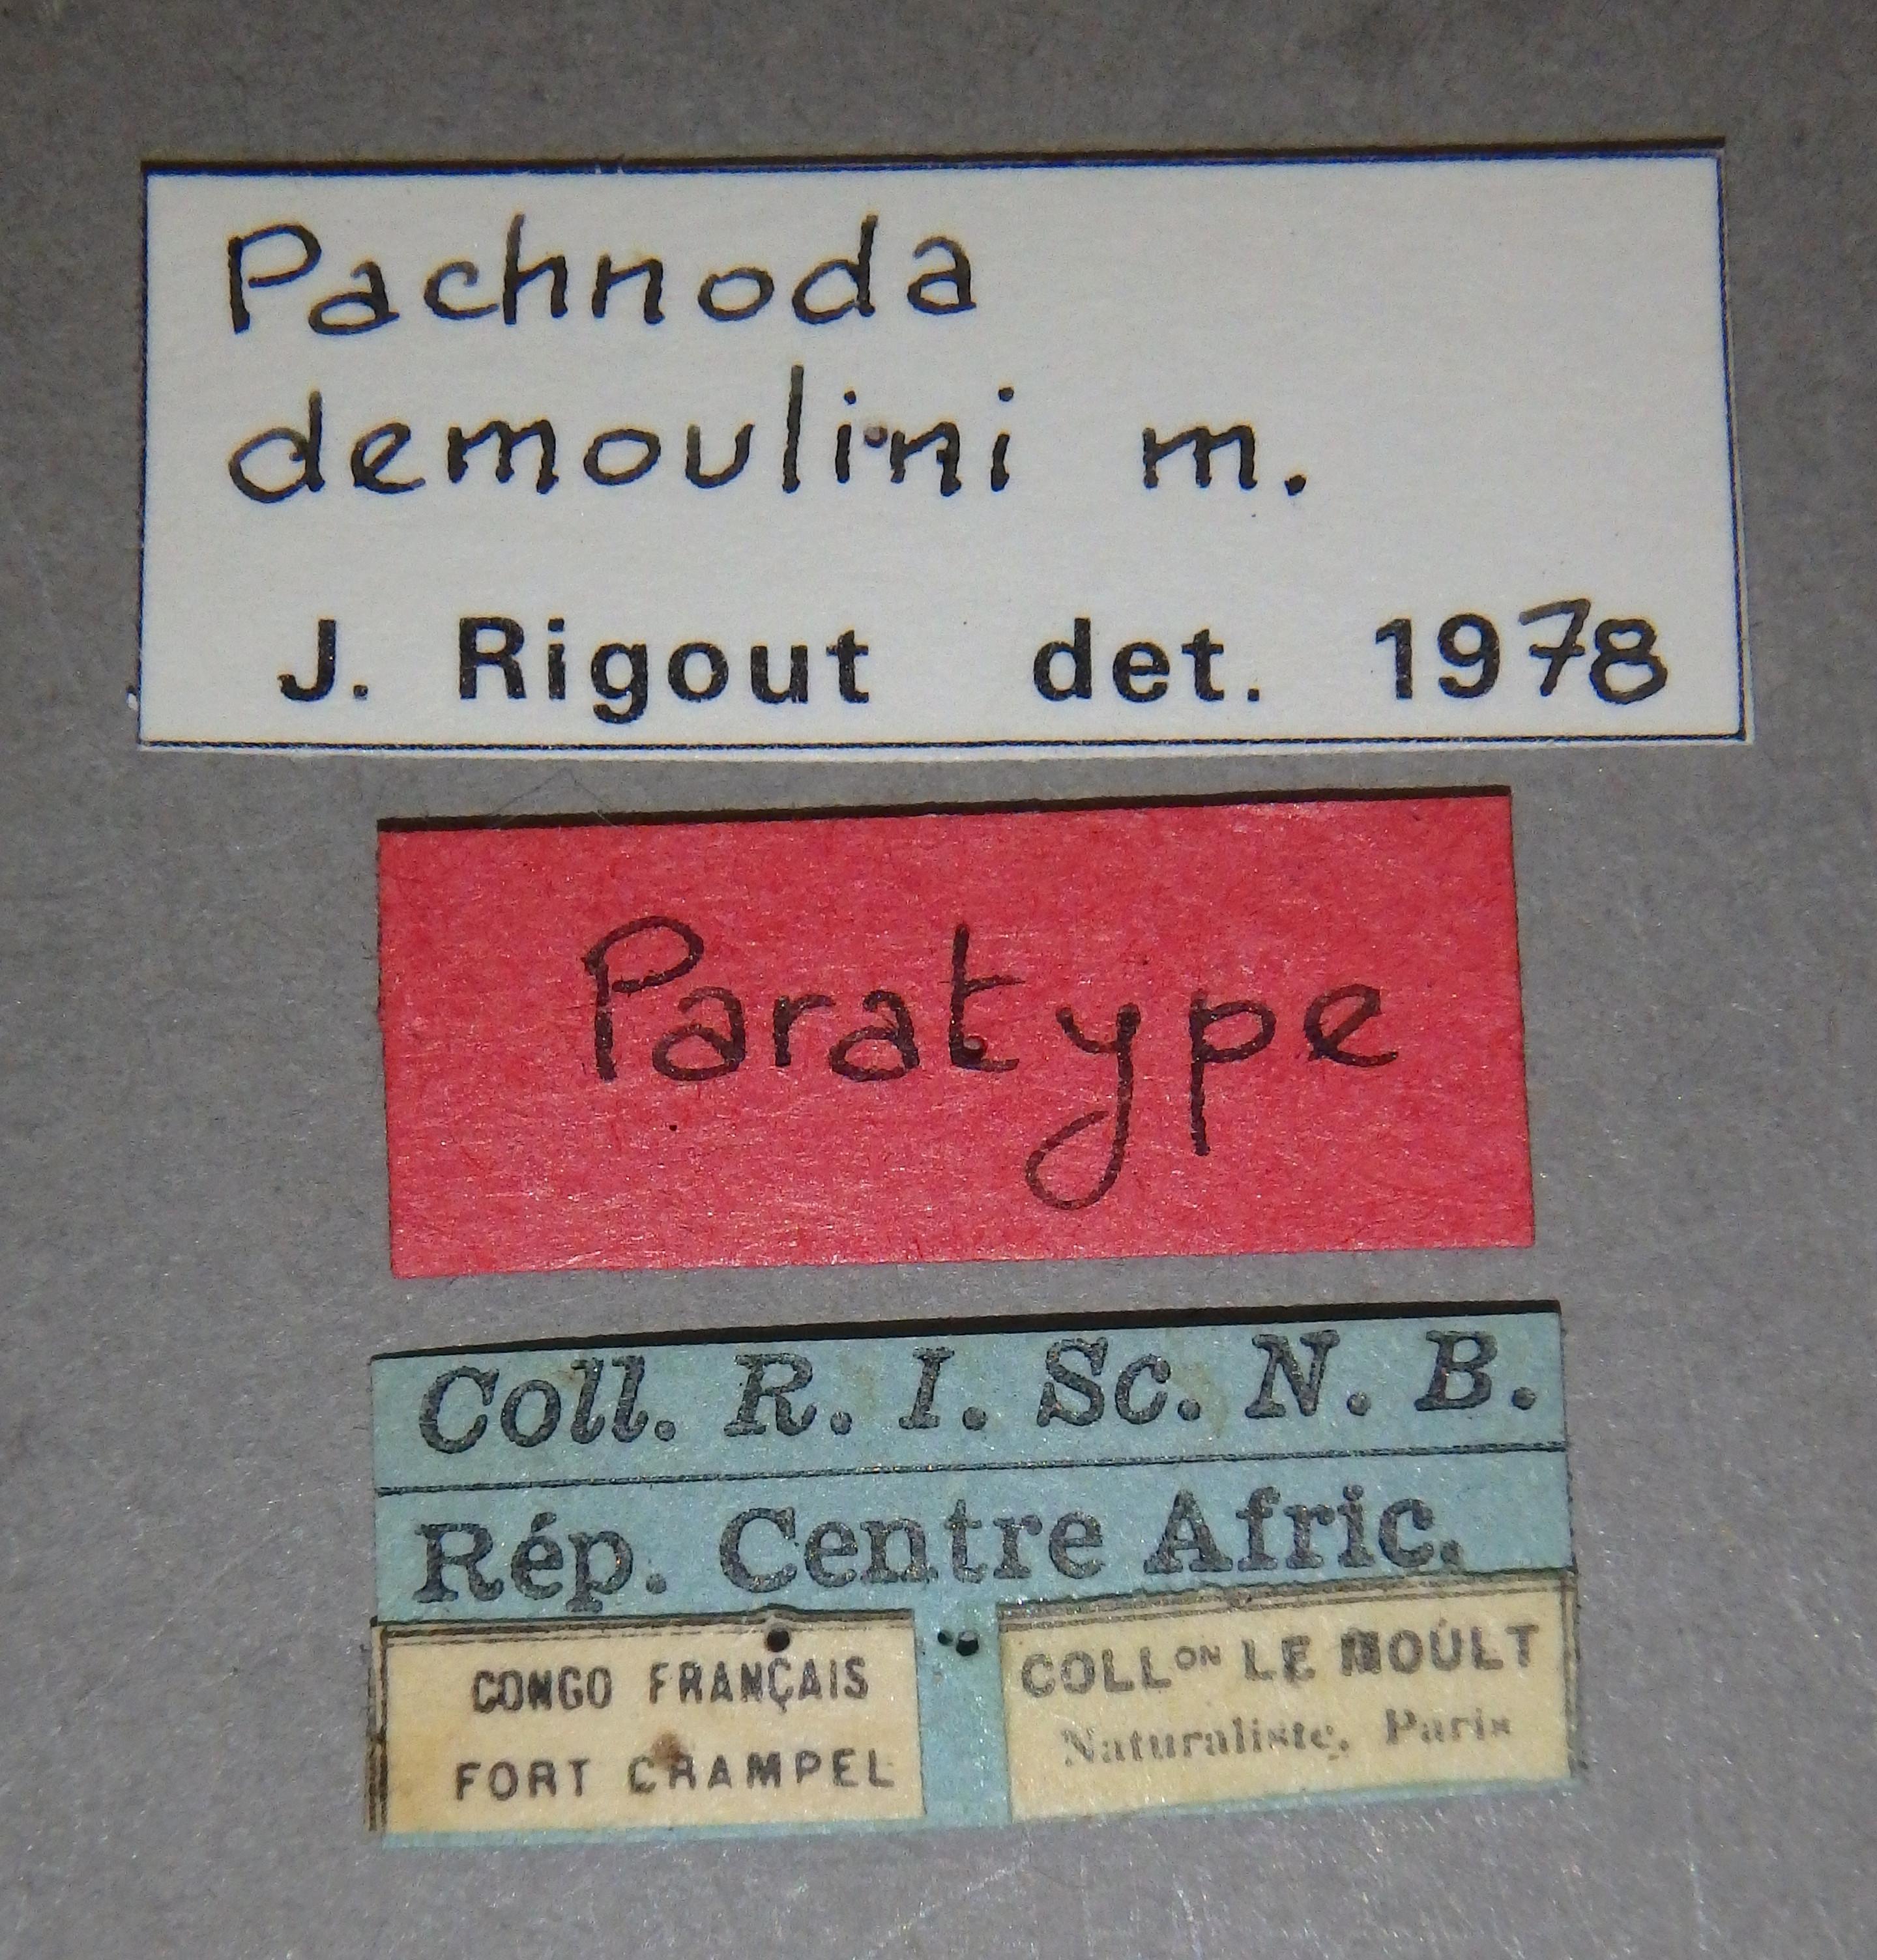 Pachnoda demoulini pt2 Lb.JPG